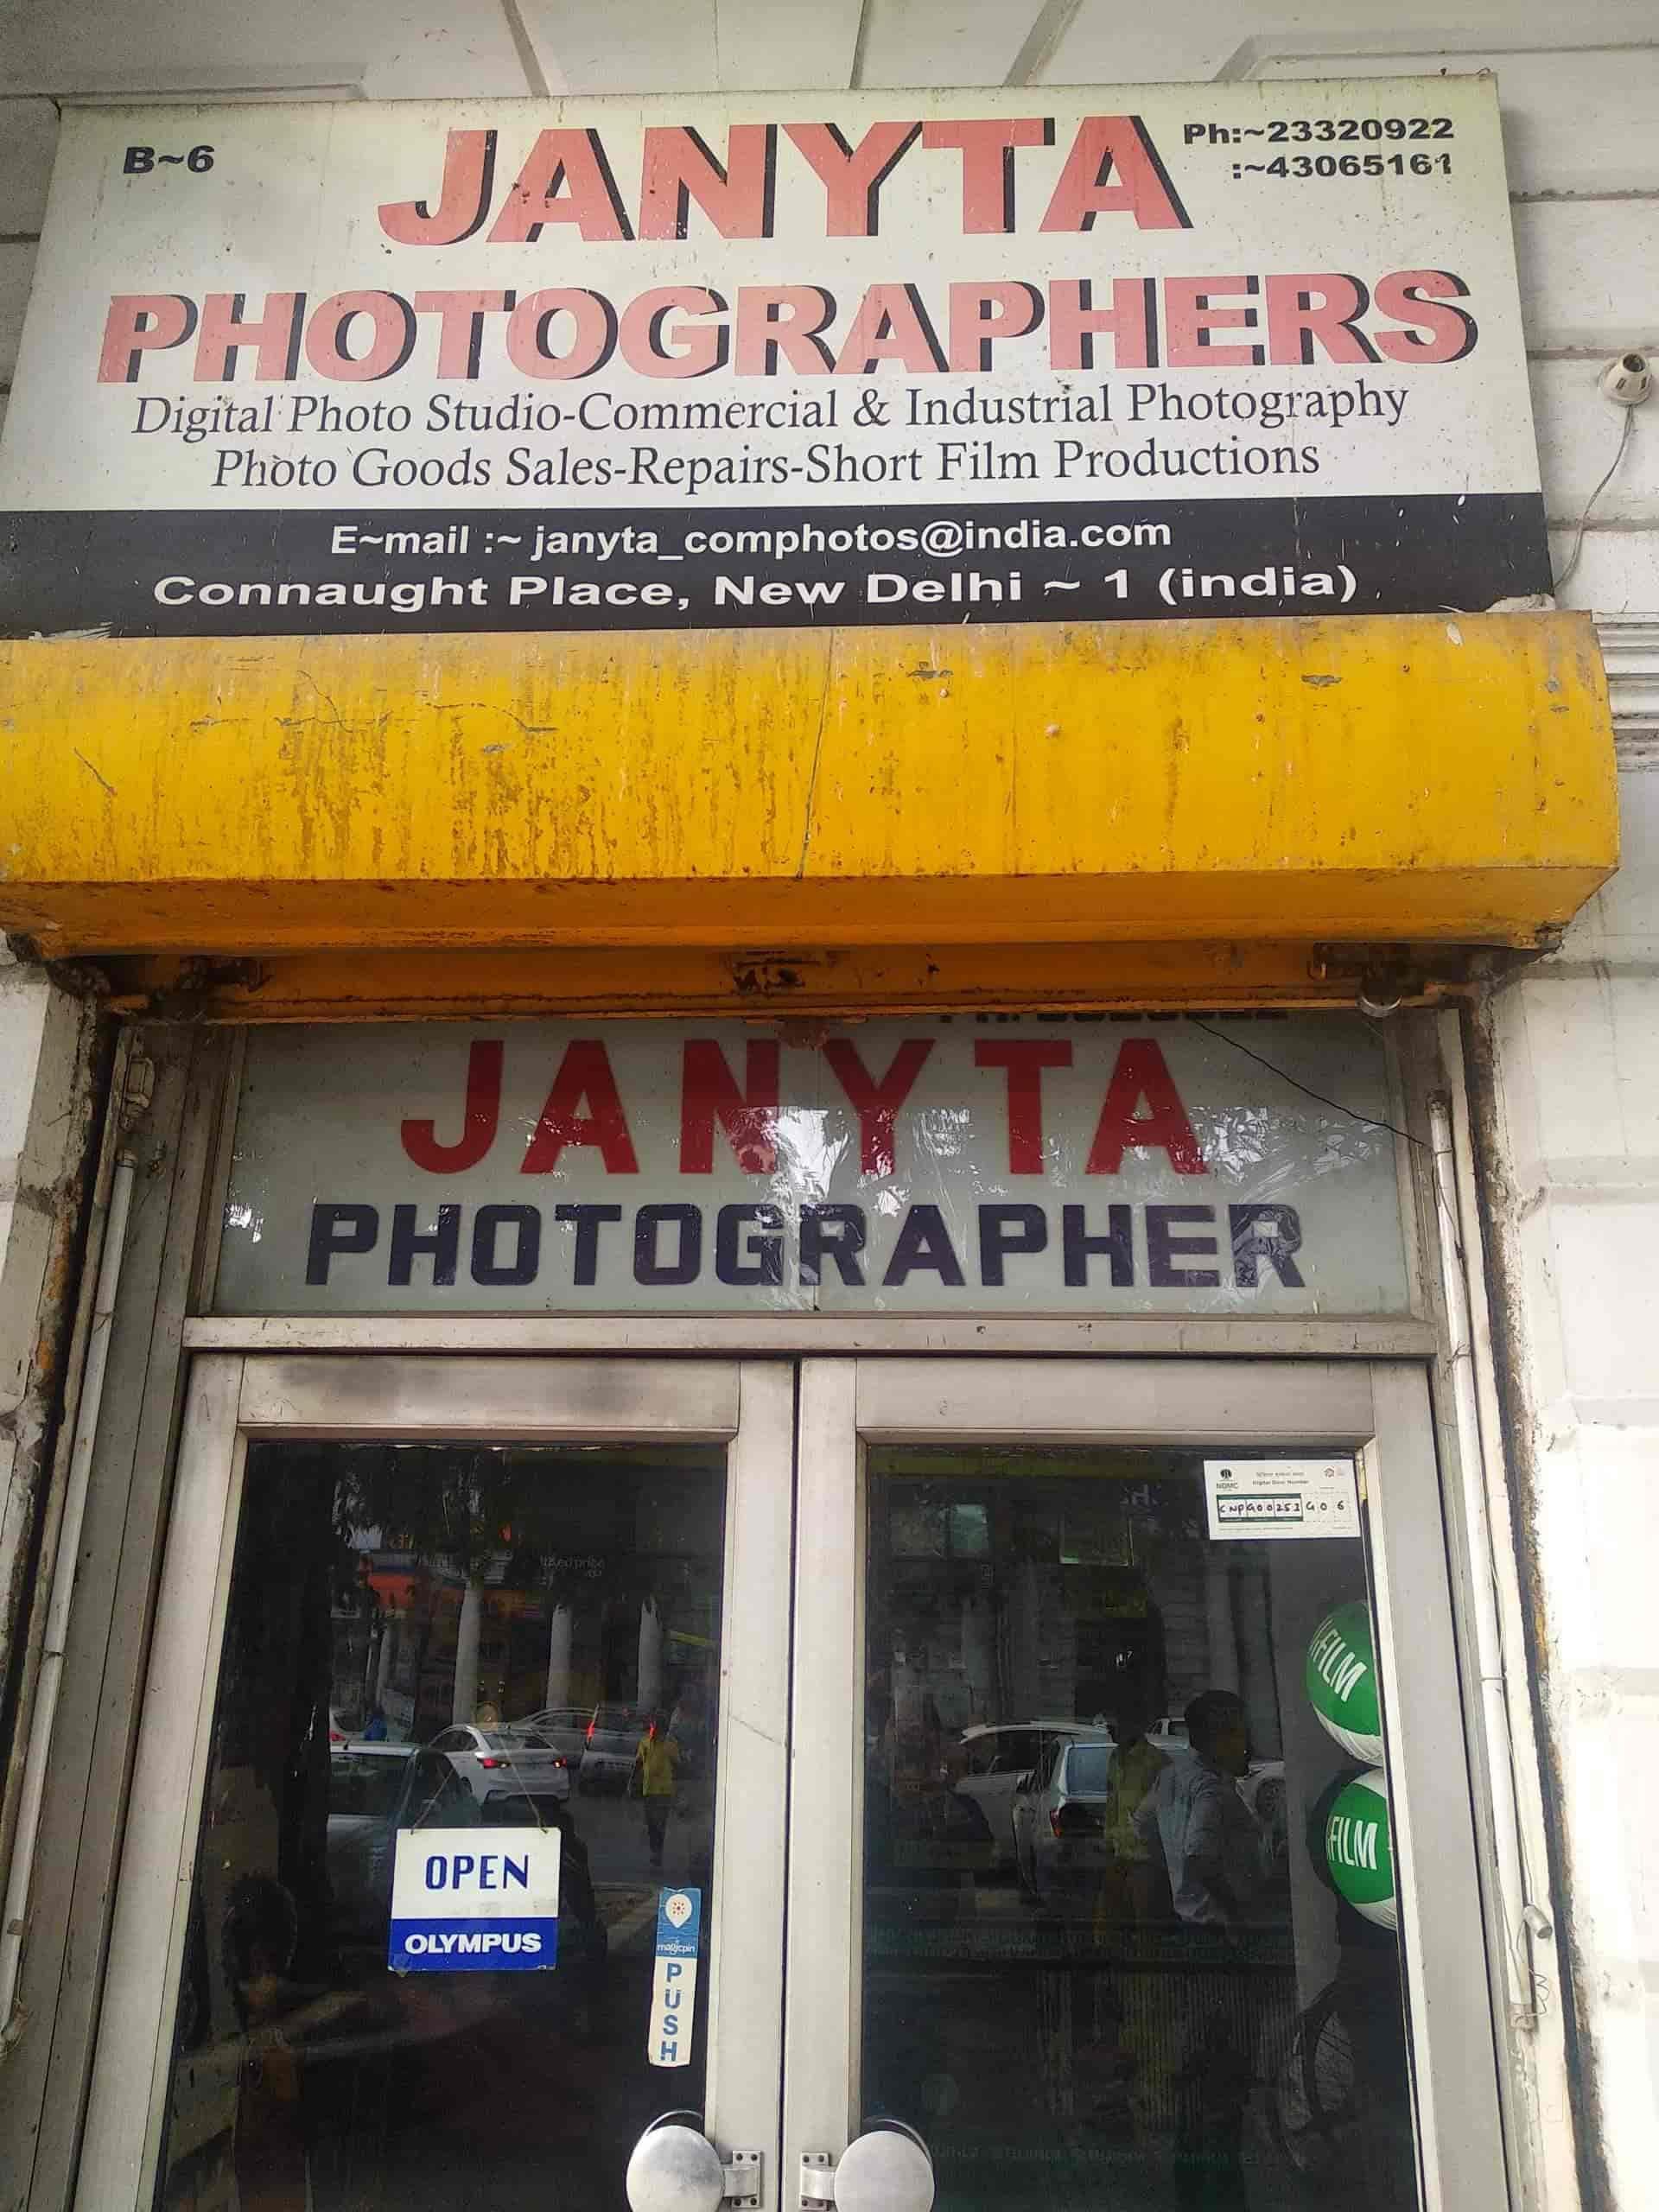 Janyta Photographers Photos, Connaught Place, Delhi